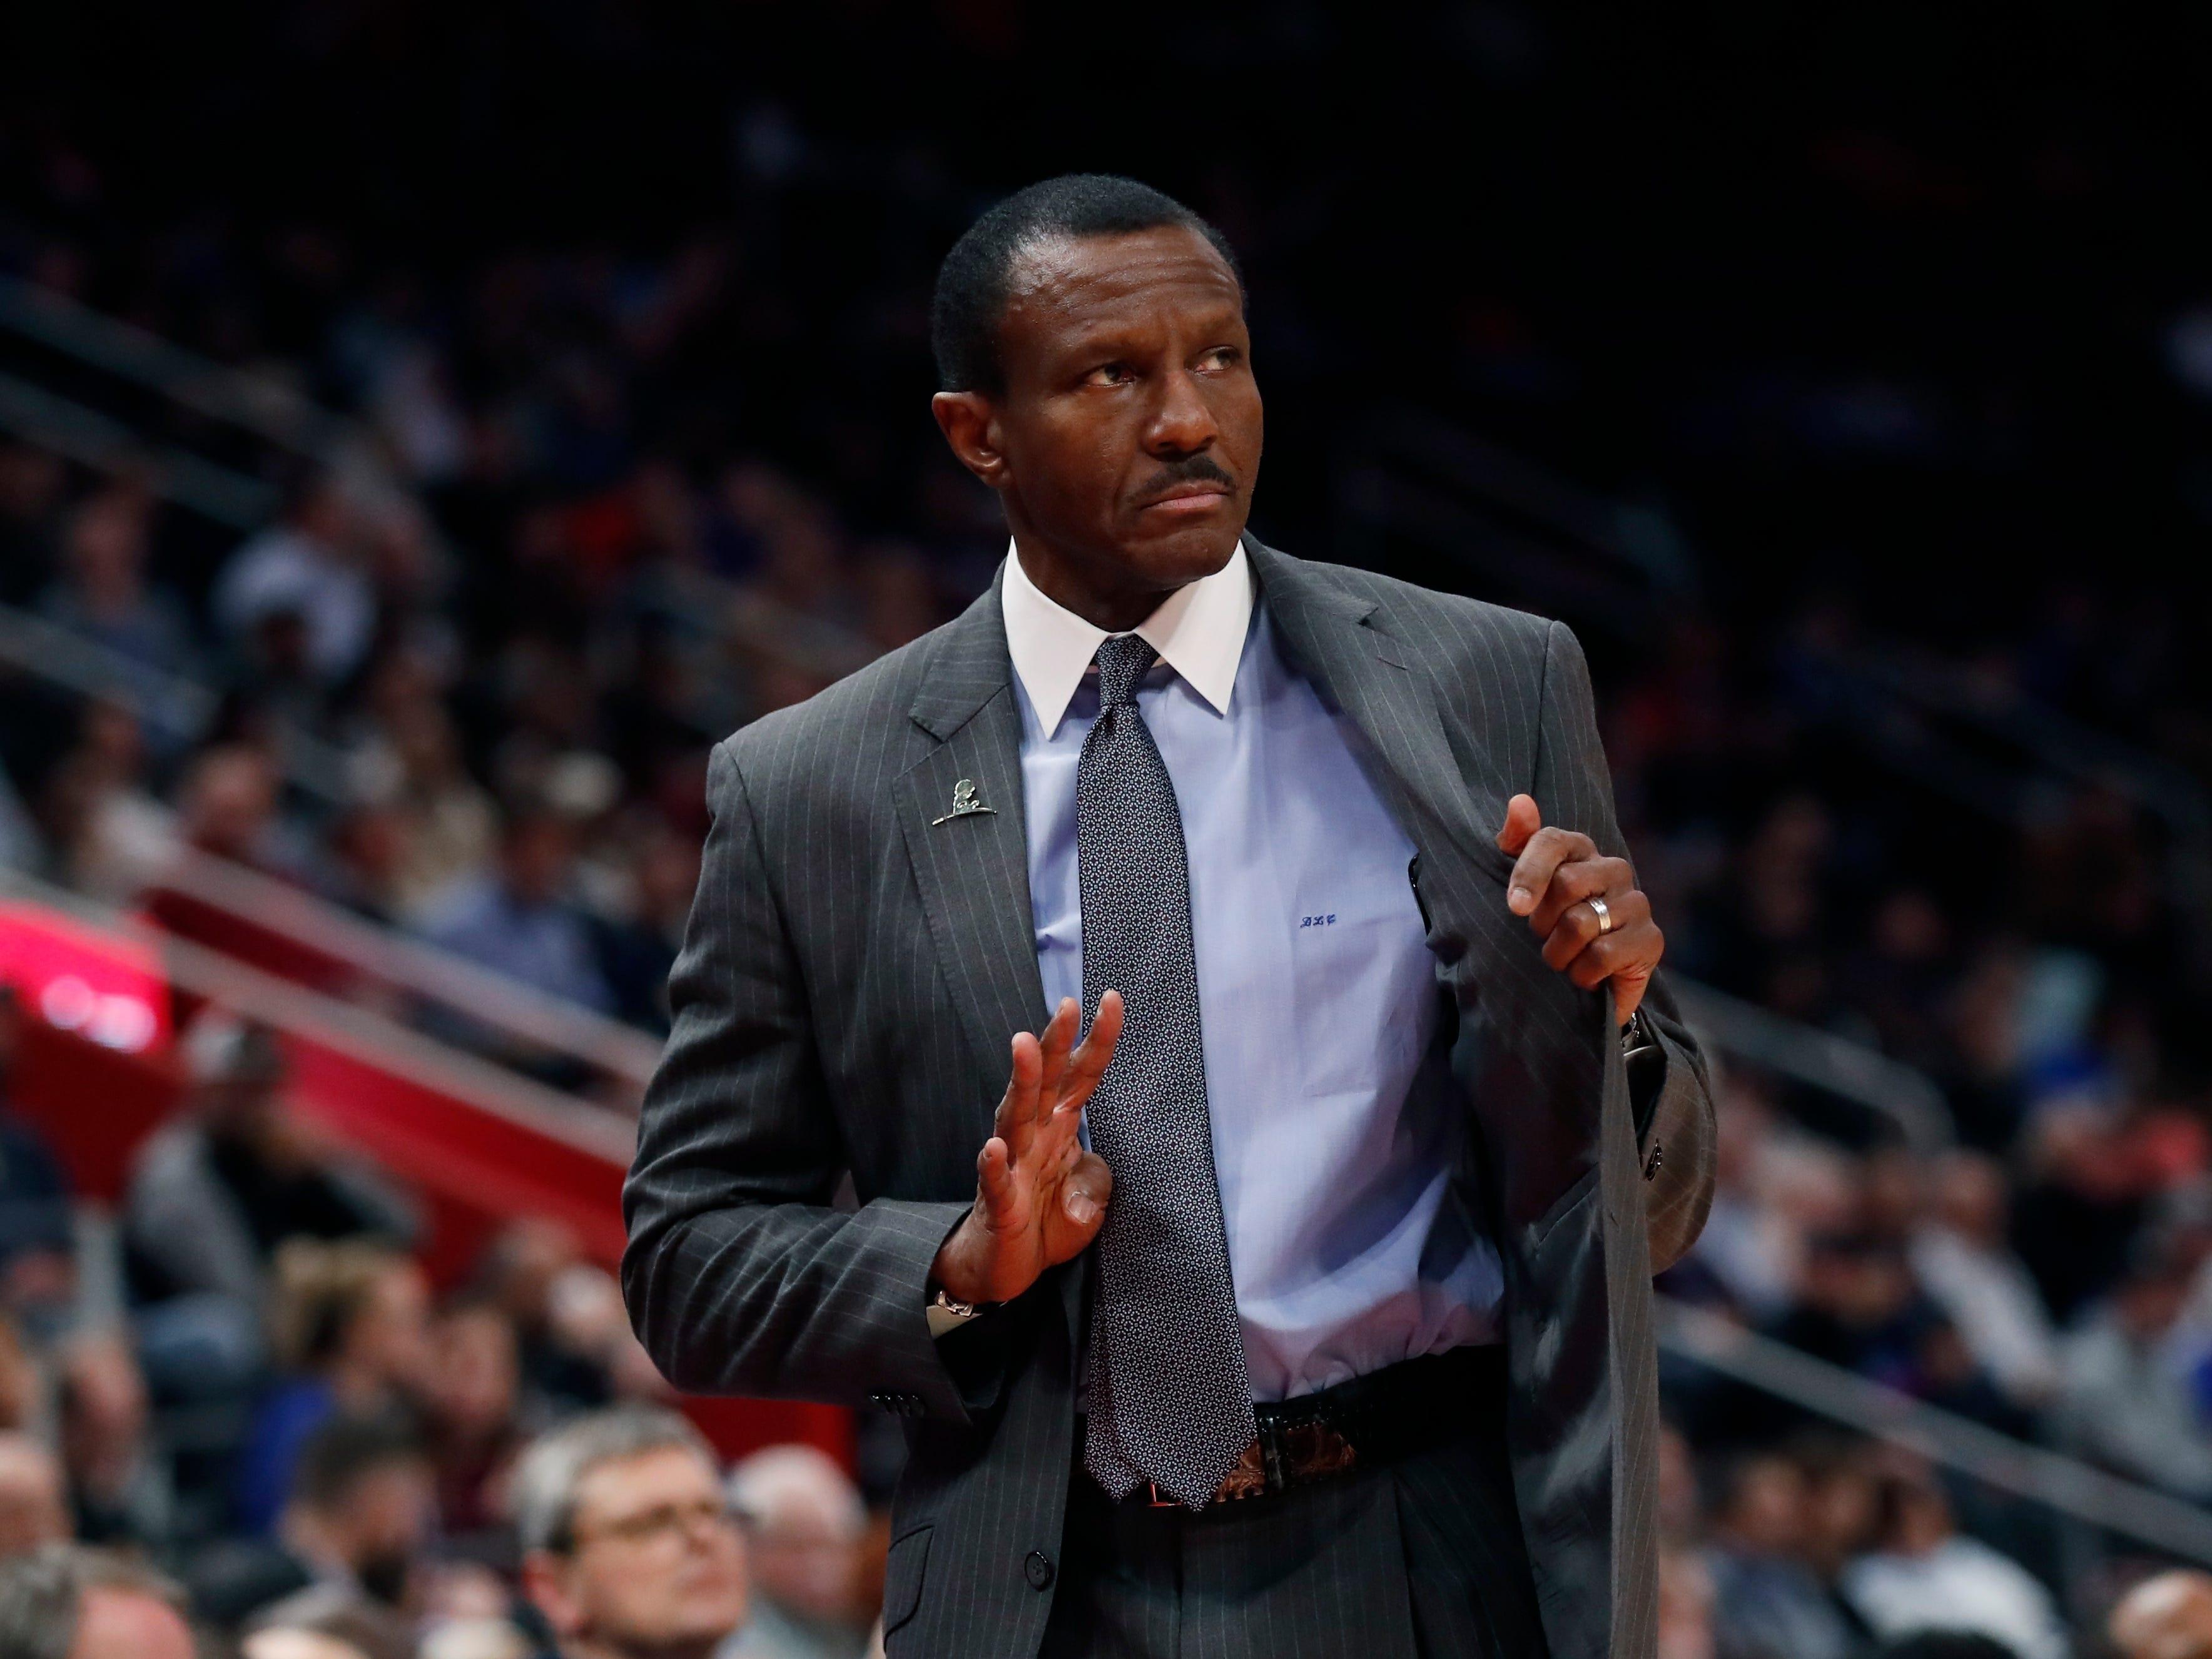 Detroit Pistons head coach Dwane Casey signals during the first half.